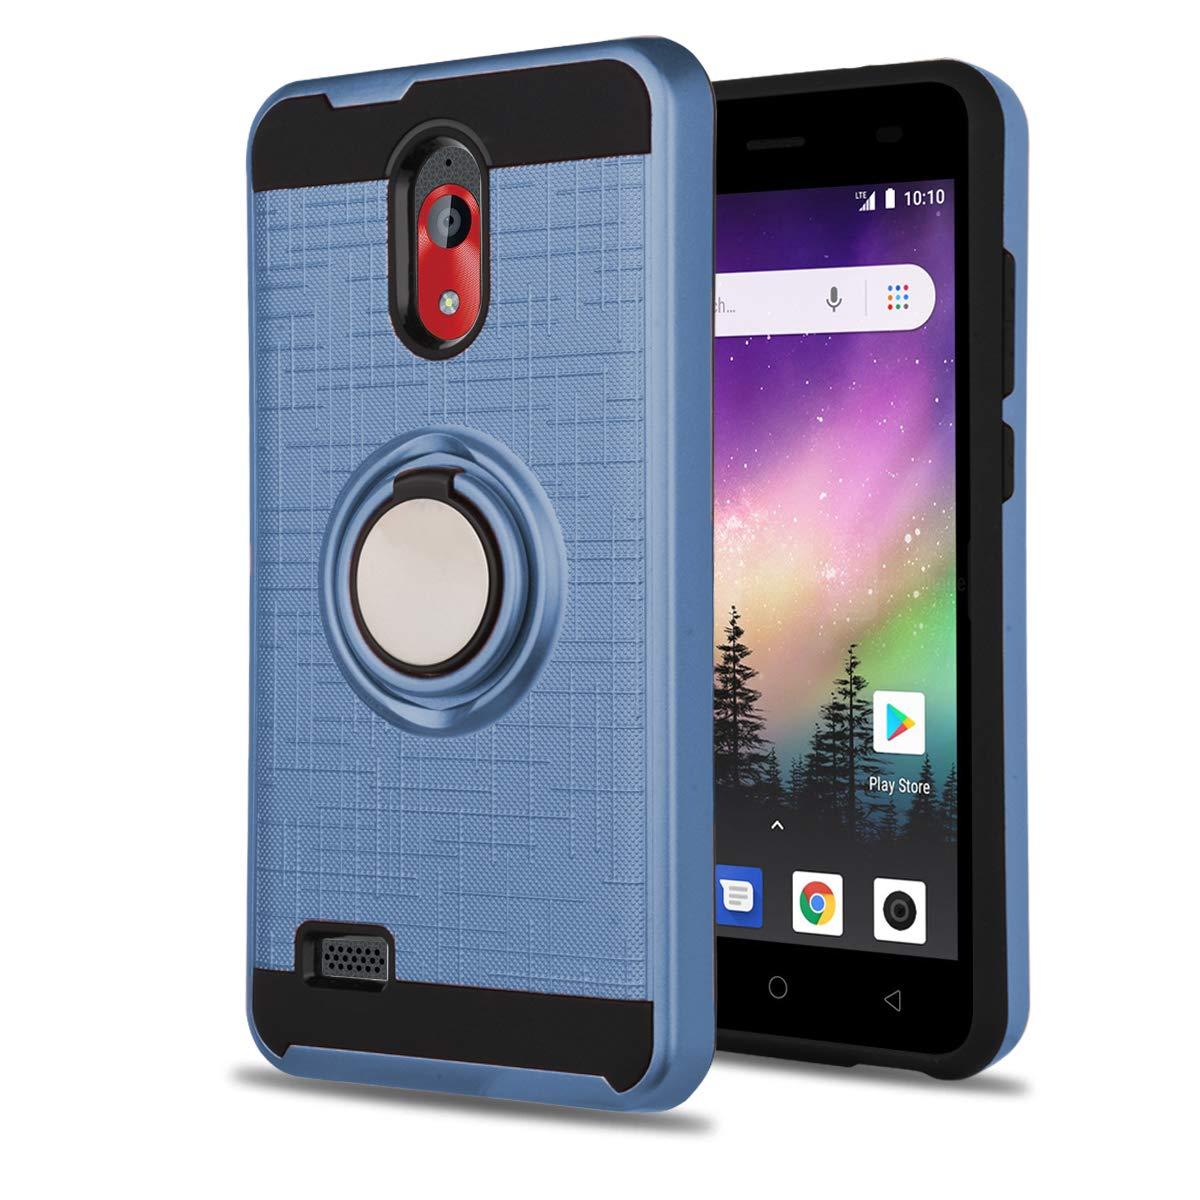 Amazon com: Coolpad Illumina (2018) Case,Coolpad 3310A Phone Cases